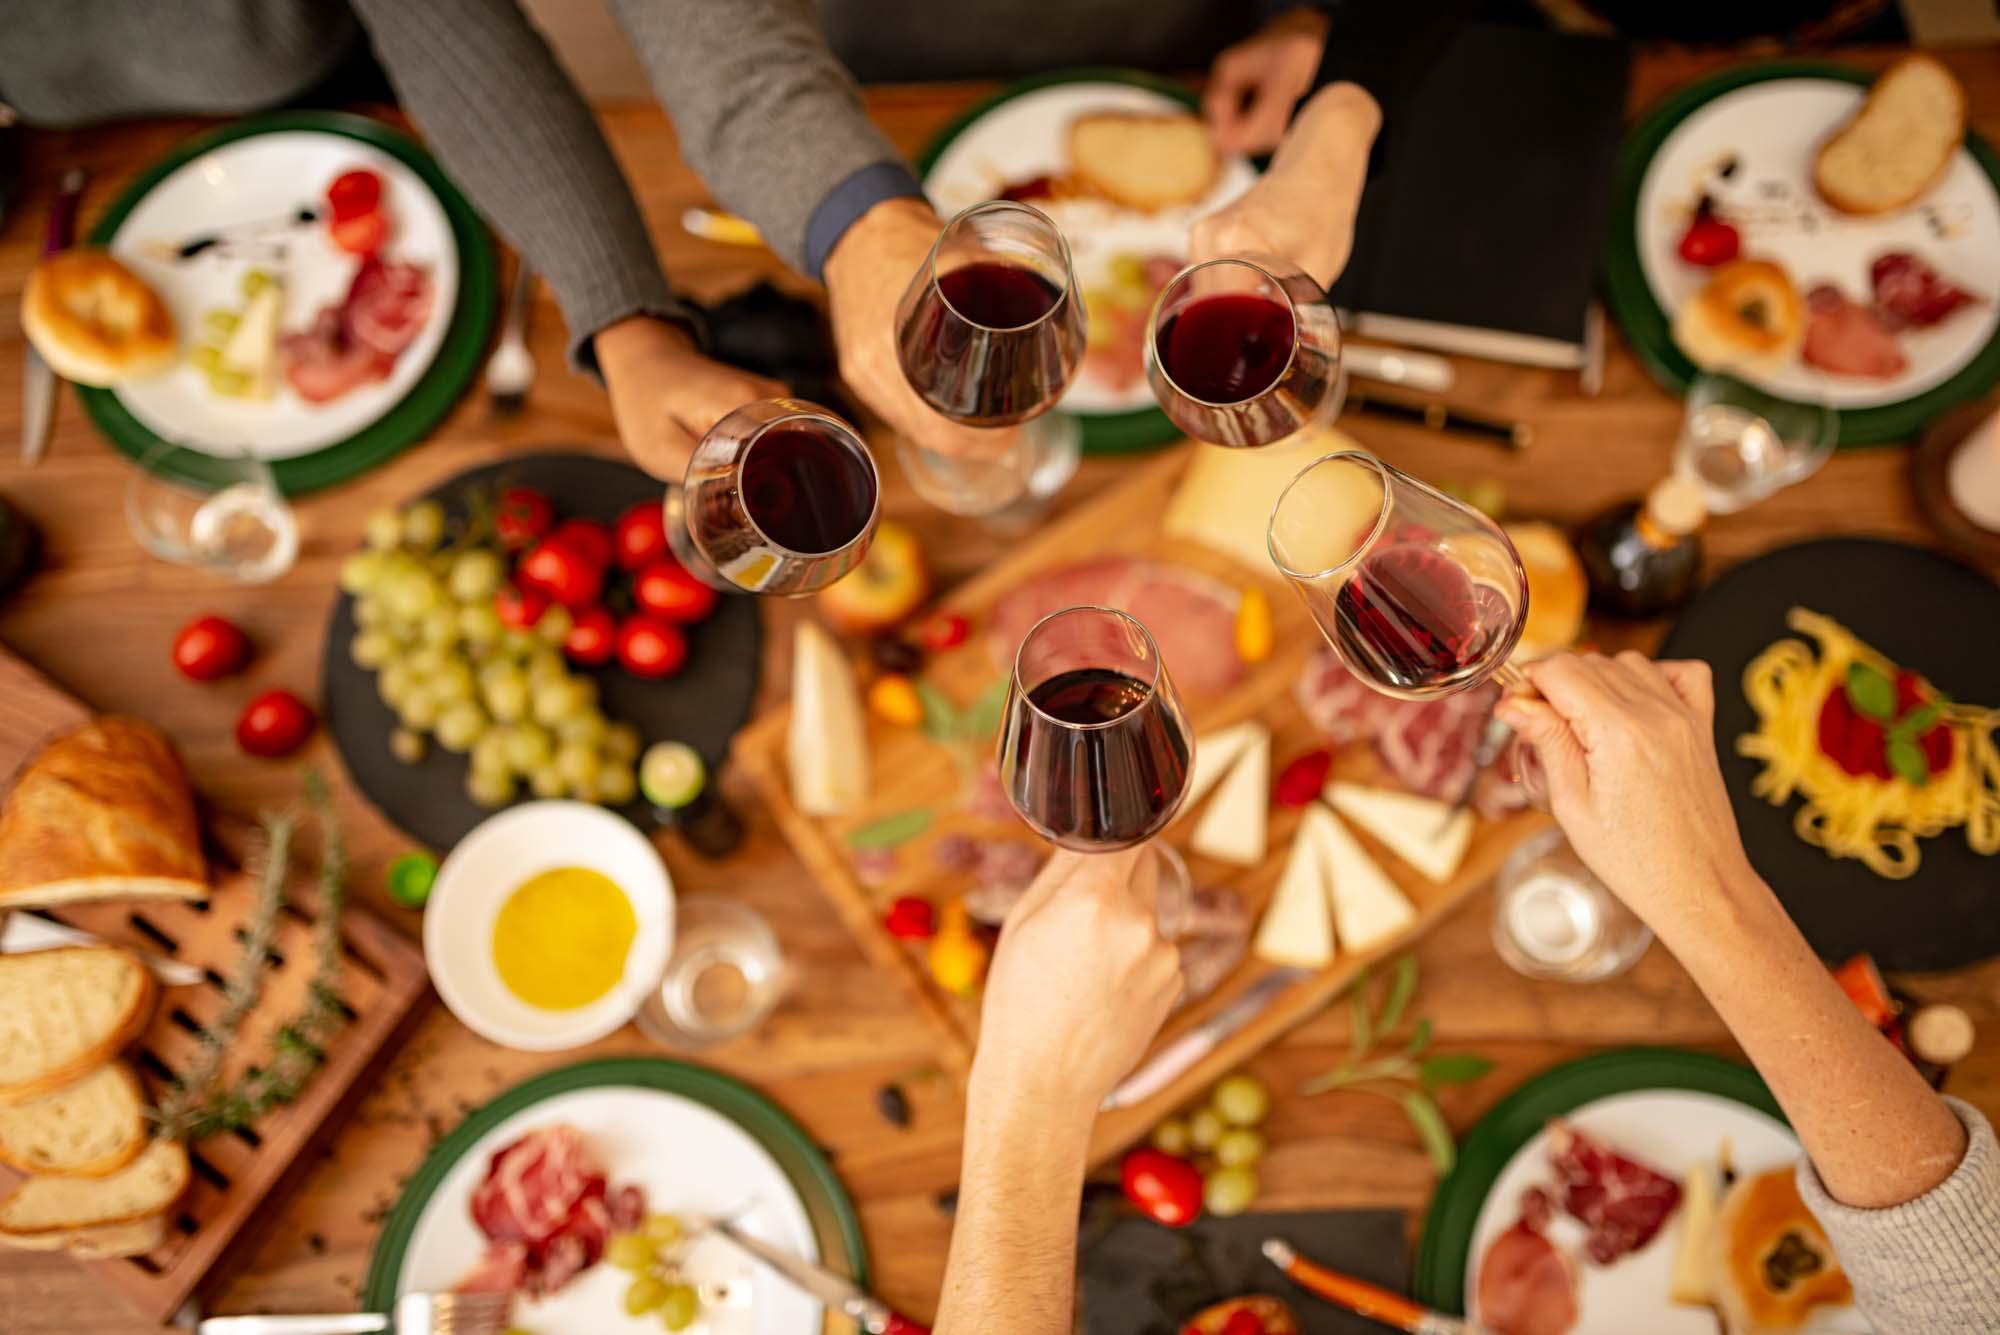 Corsi Di Cucina Eventi Aziendali a Cagliari